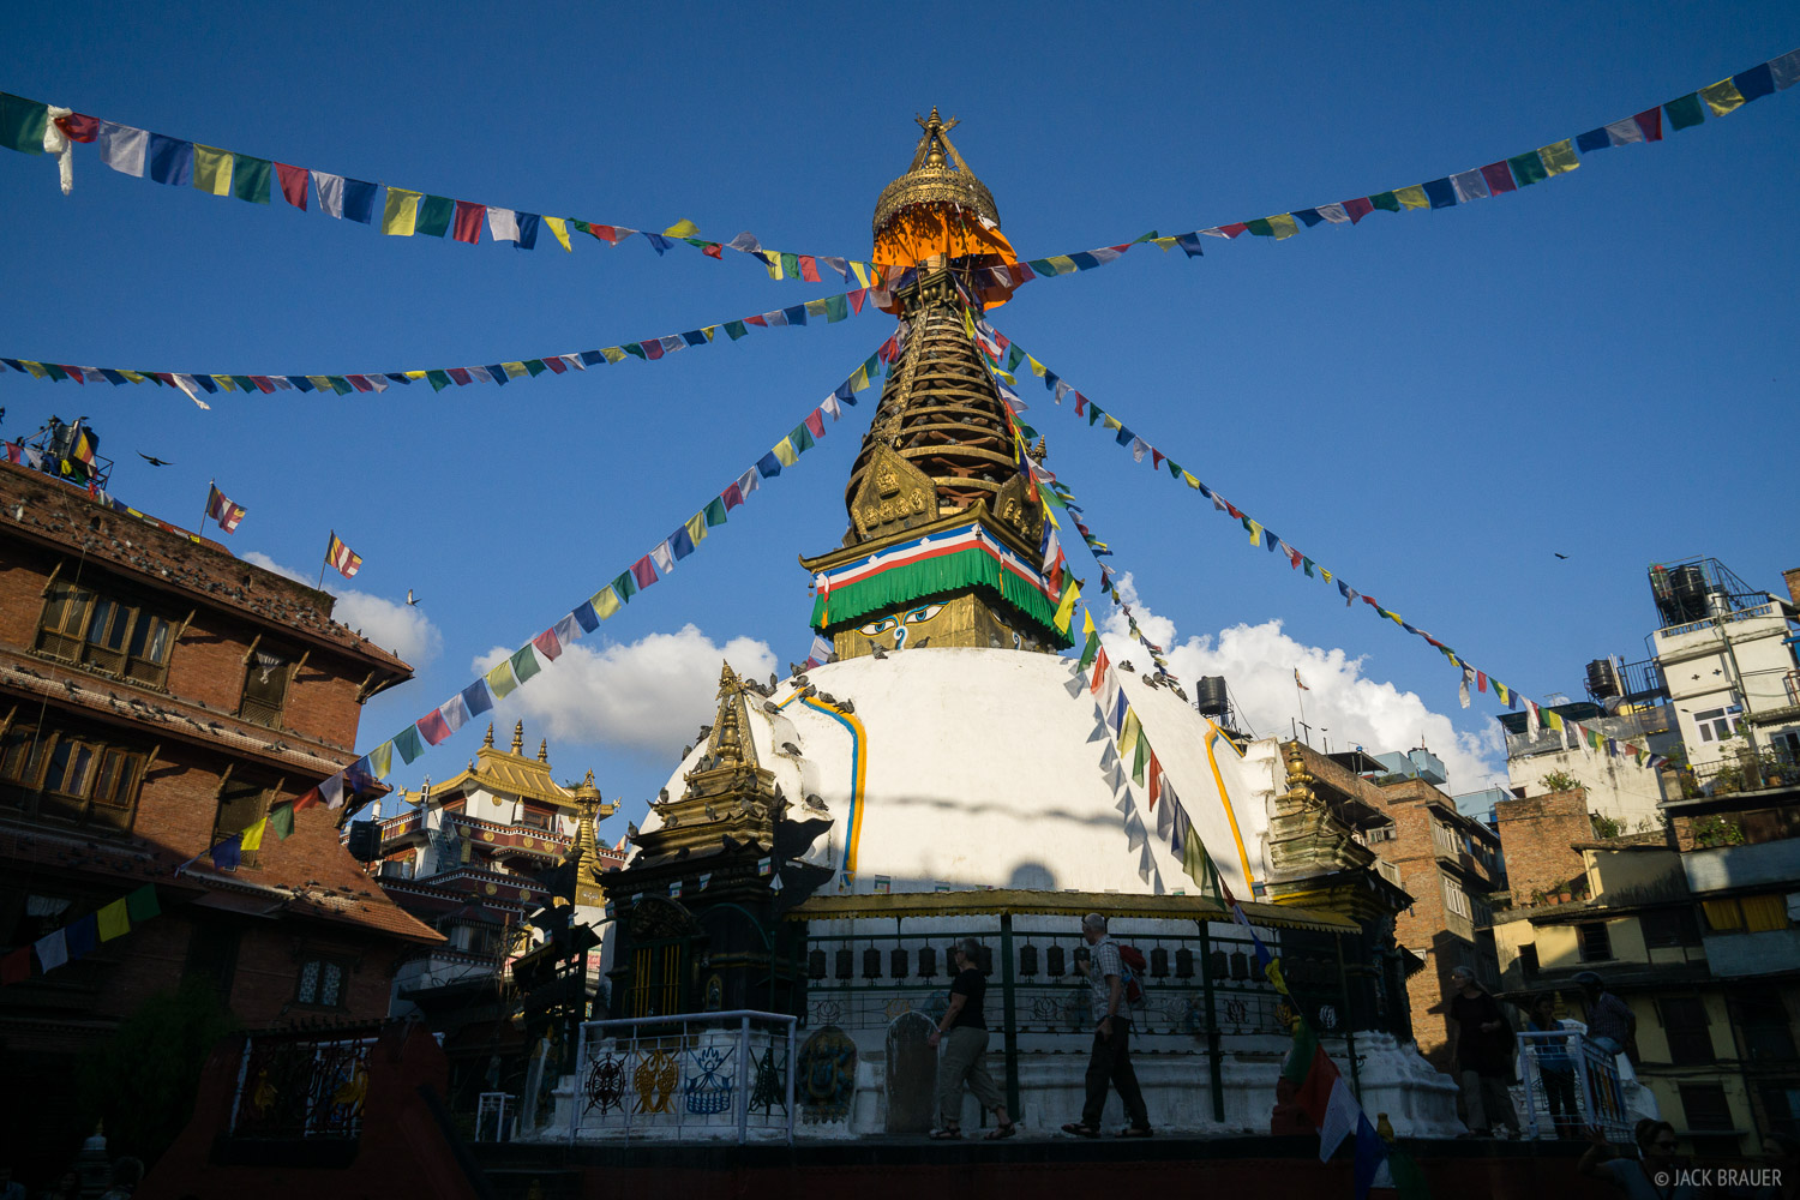 A Buddhist stupa in the Thamel district of Kathmandu.